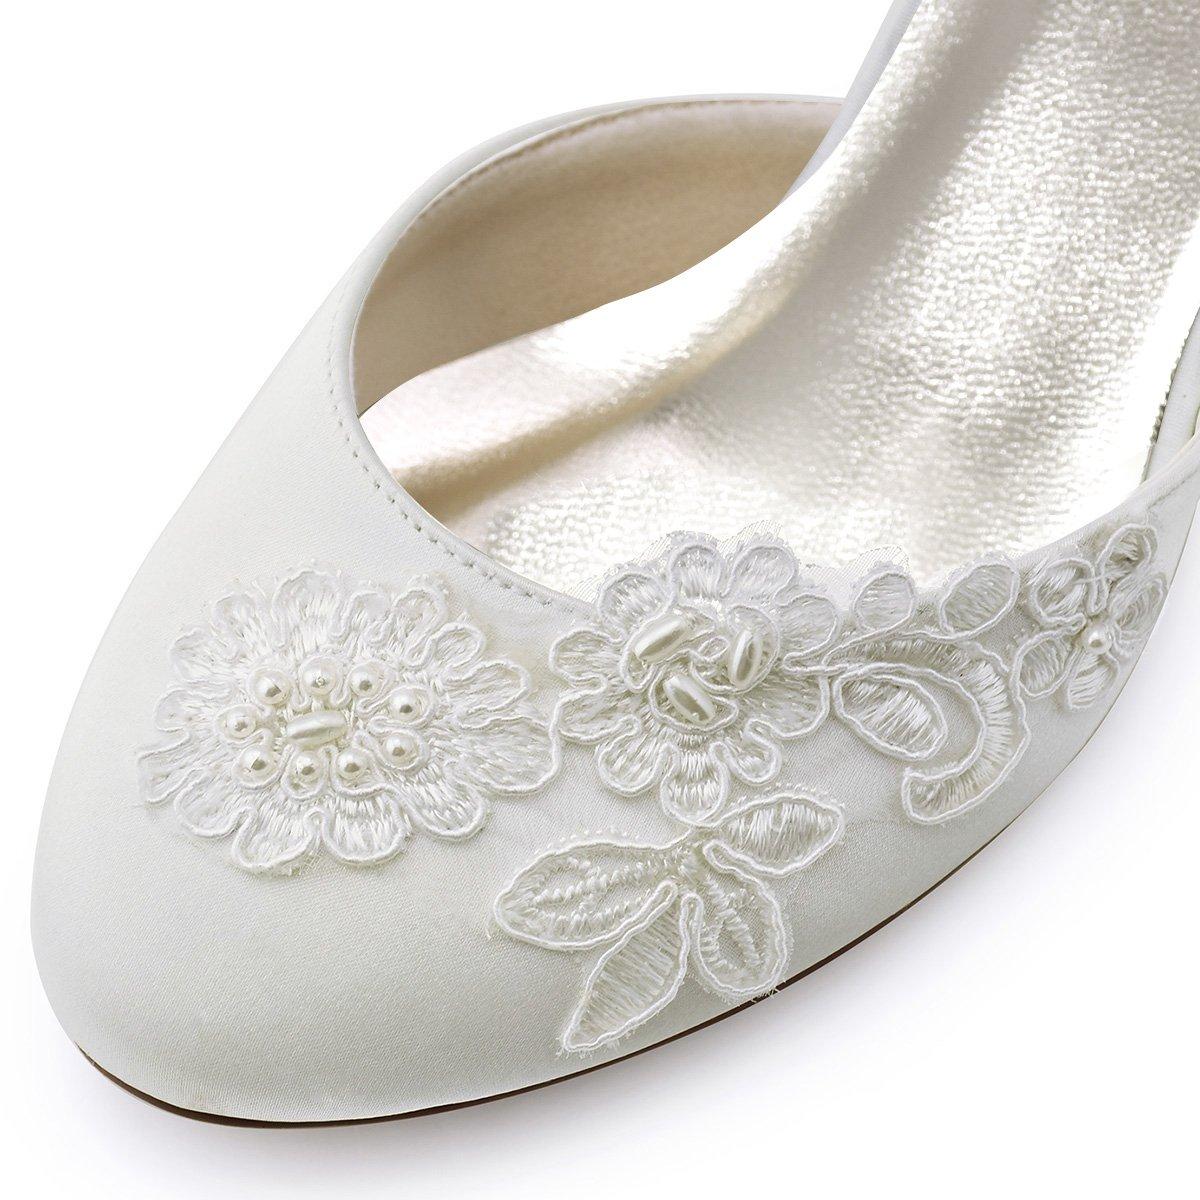 Elegantpark HC1604 Ivory Damen Geschlossene Zehen Stickerei Perlen Satin Brautschuhe